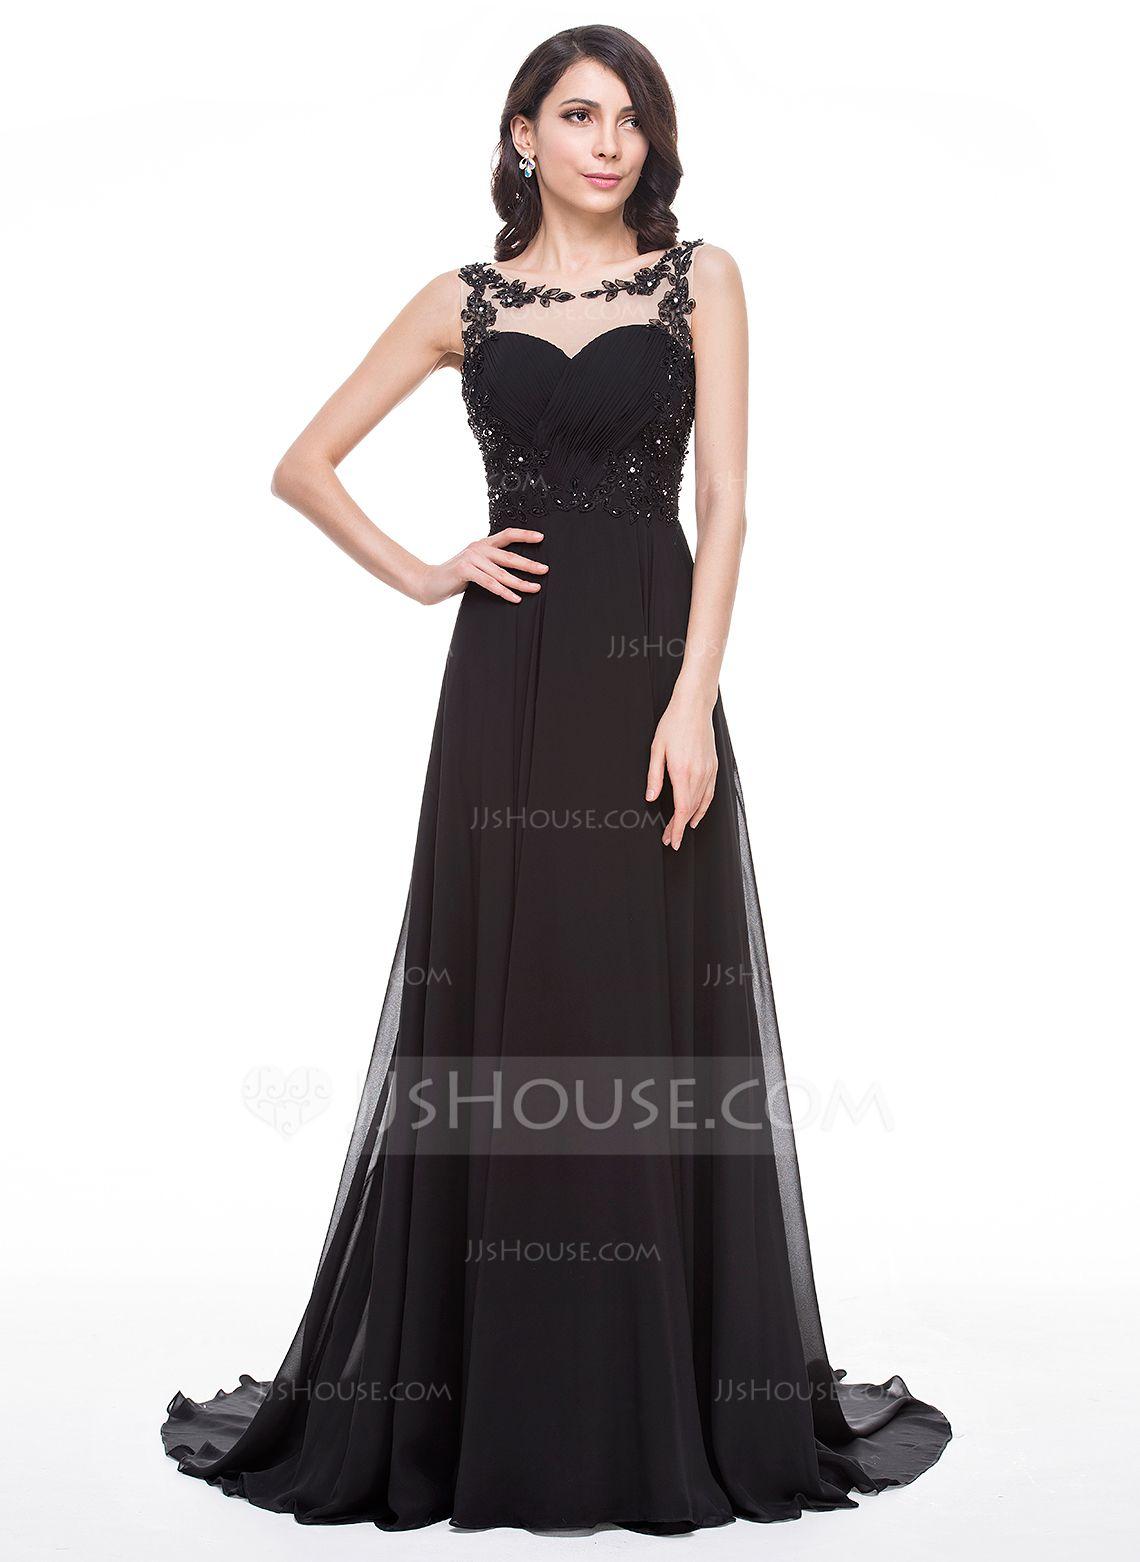 Alineprincess scoop neck court train chiffon prom dress with